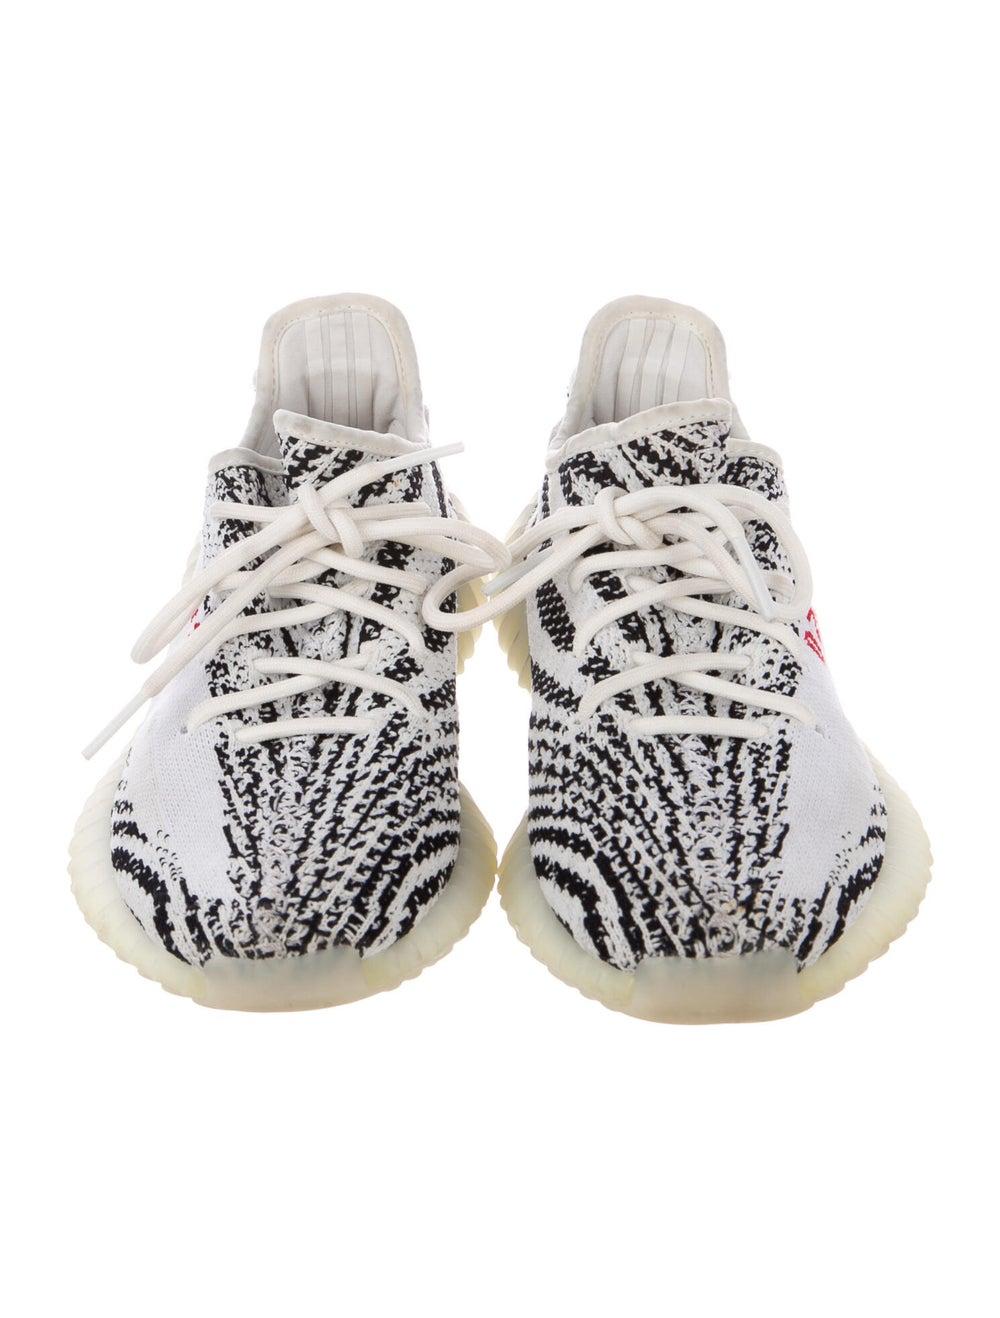 Yeezy x adidas Boost 350 V2 Zebra Sneakers Sneake… - image 3